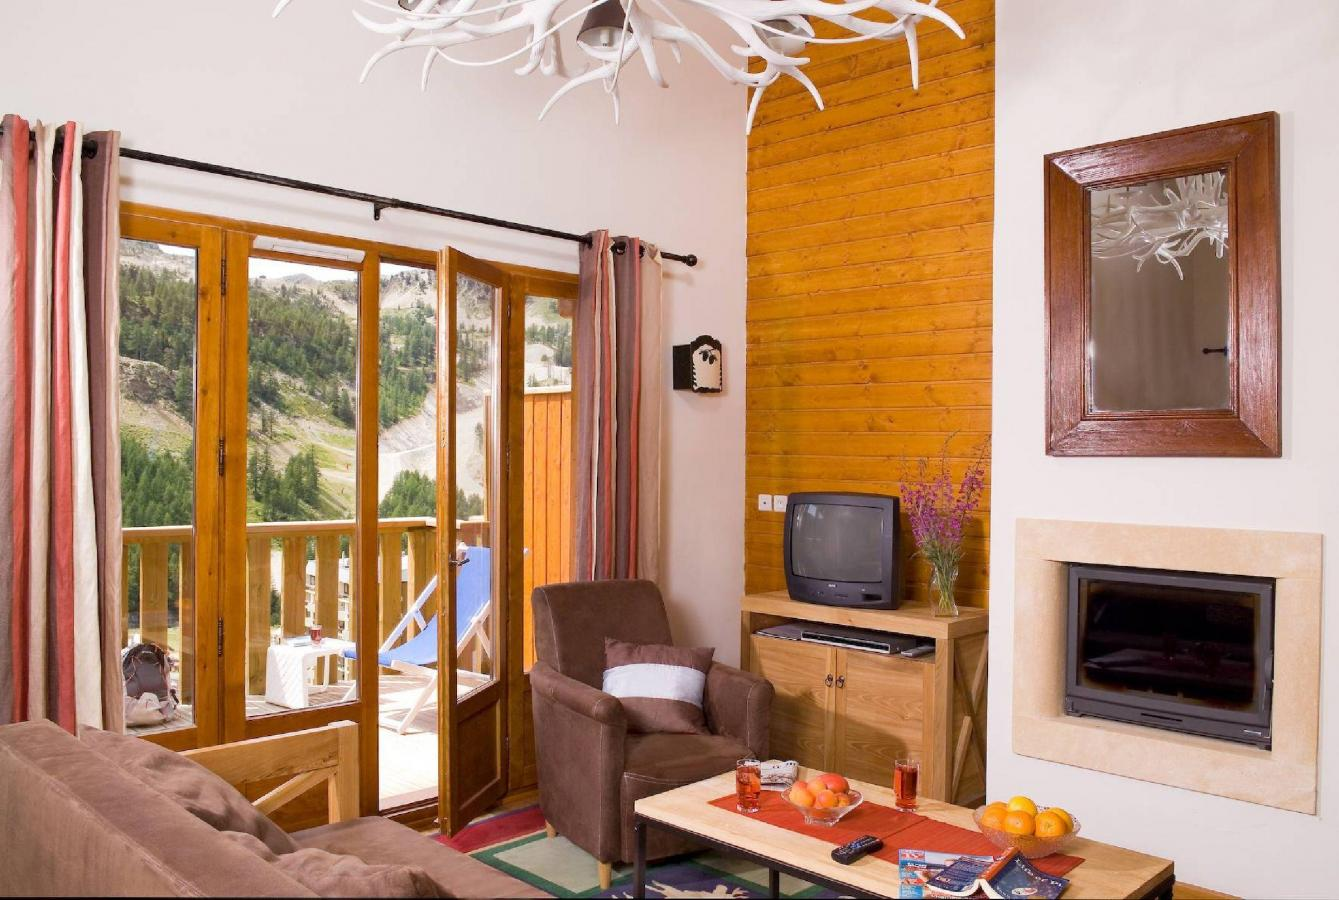 Les chalets du diva 30 isola 2000 location vacances for Diva 2000